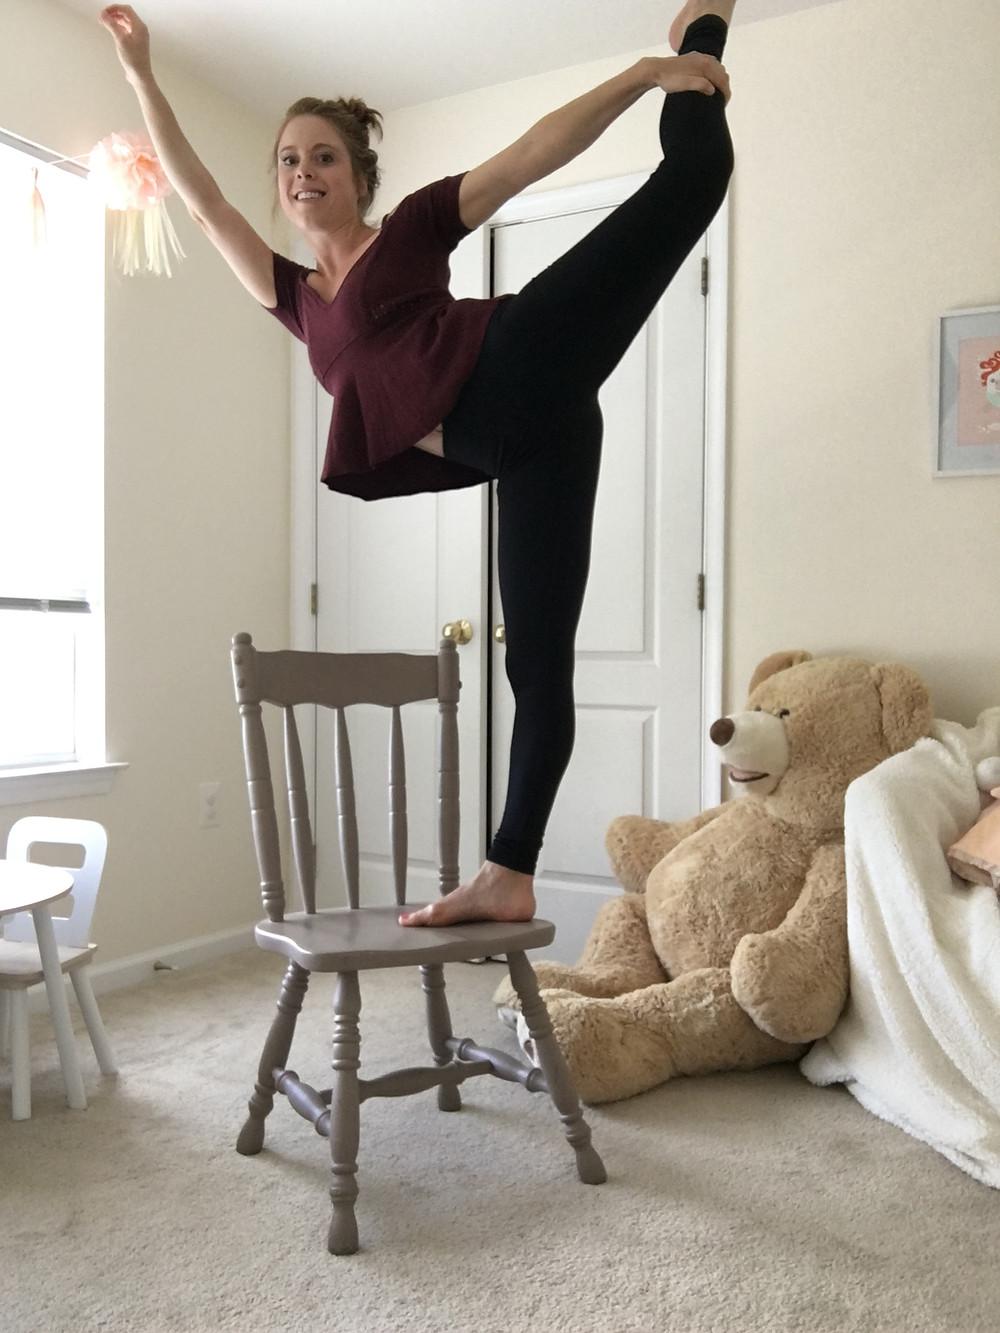 energetic cheerleading workout time